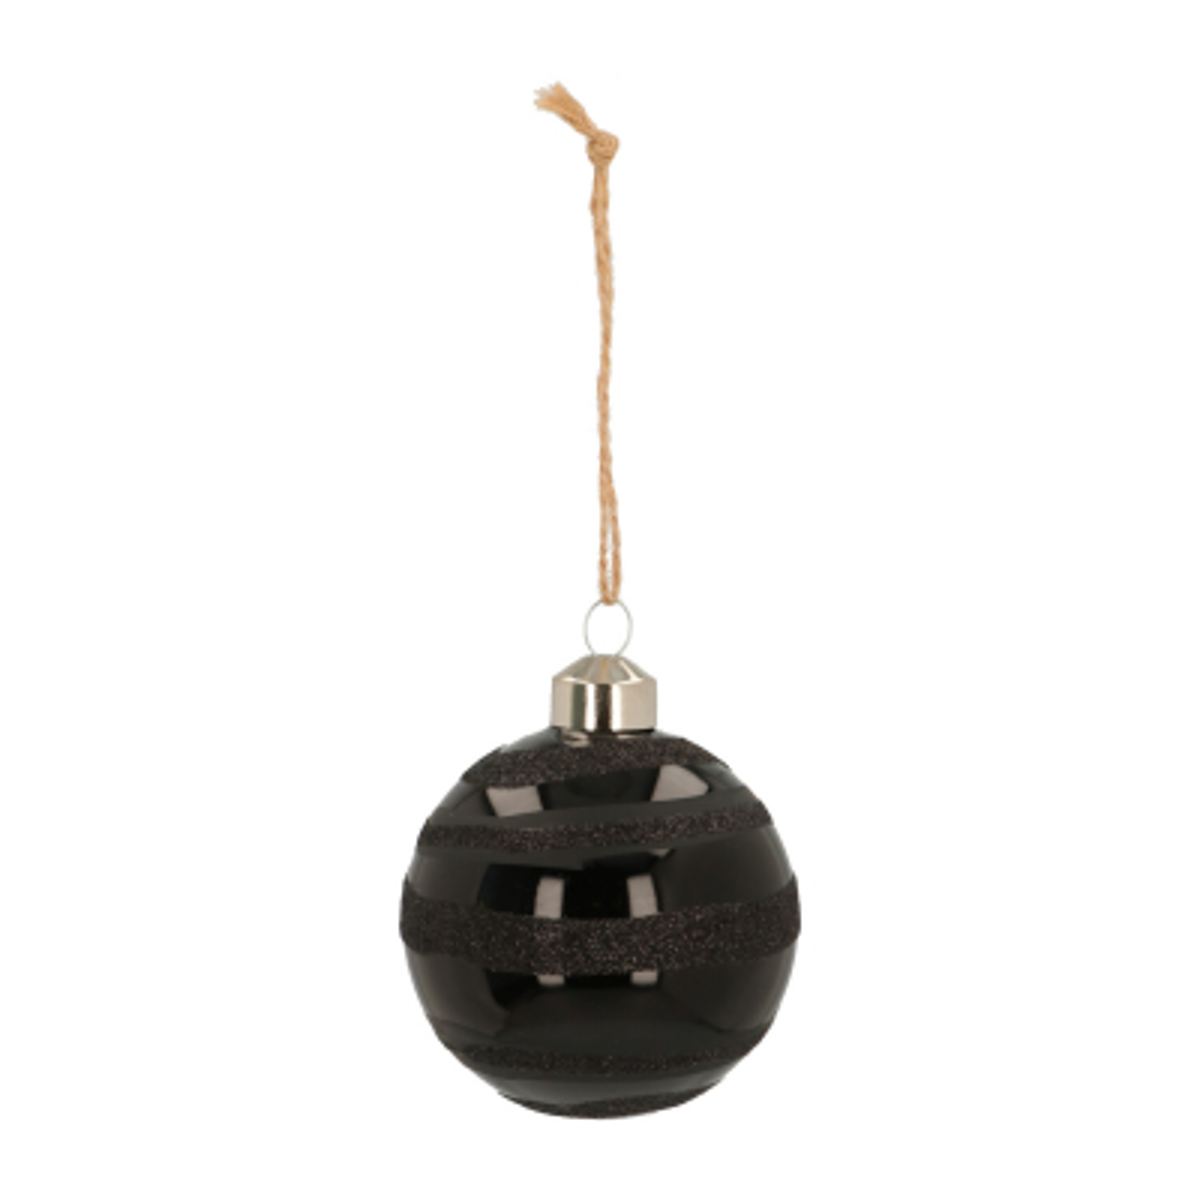 Luxe glazen kerstbal glanzend zwart matte en glitter strepen 7cm